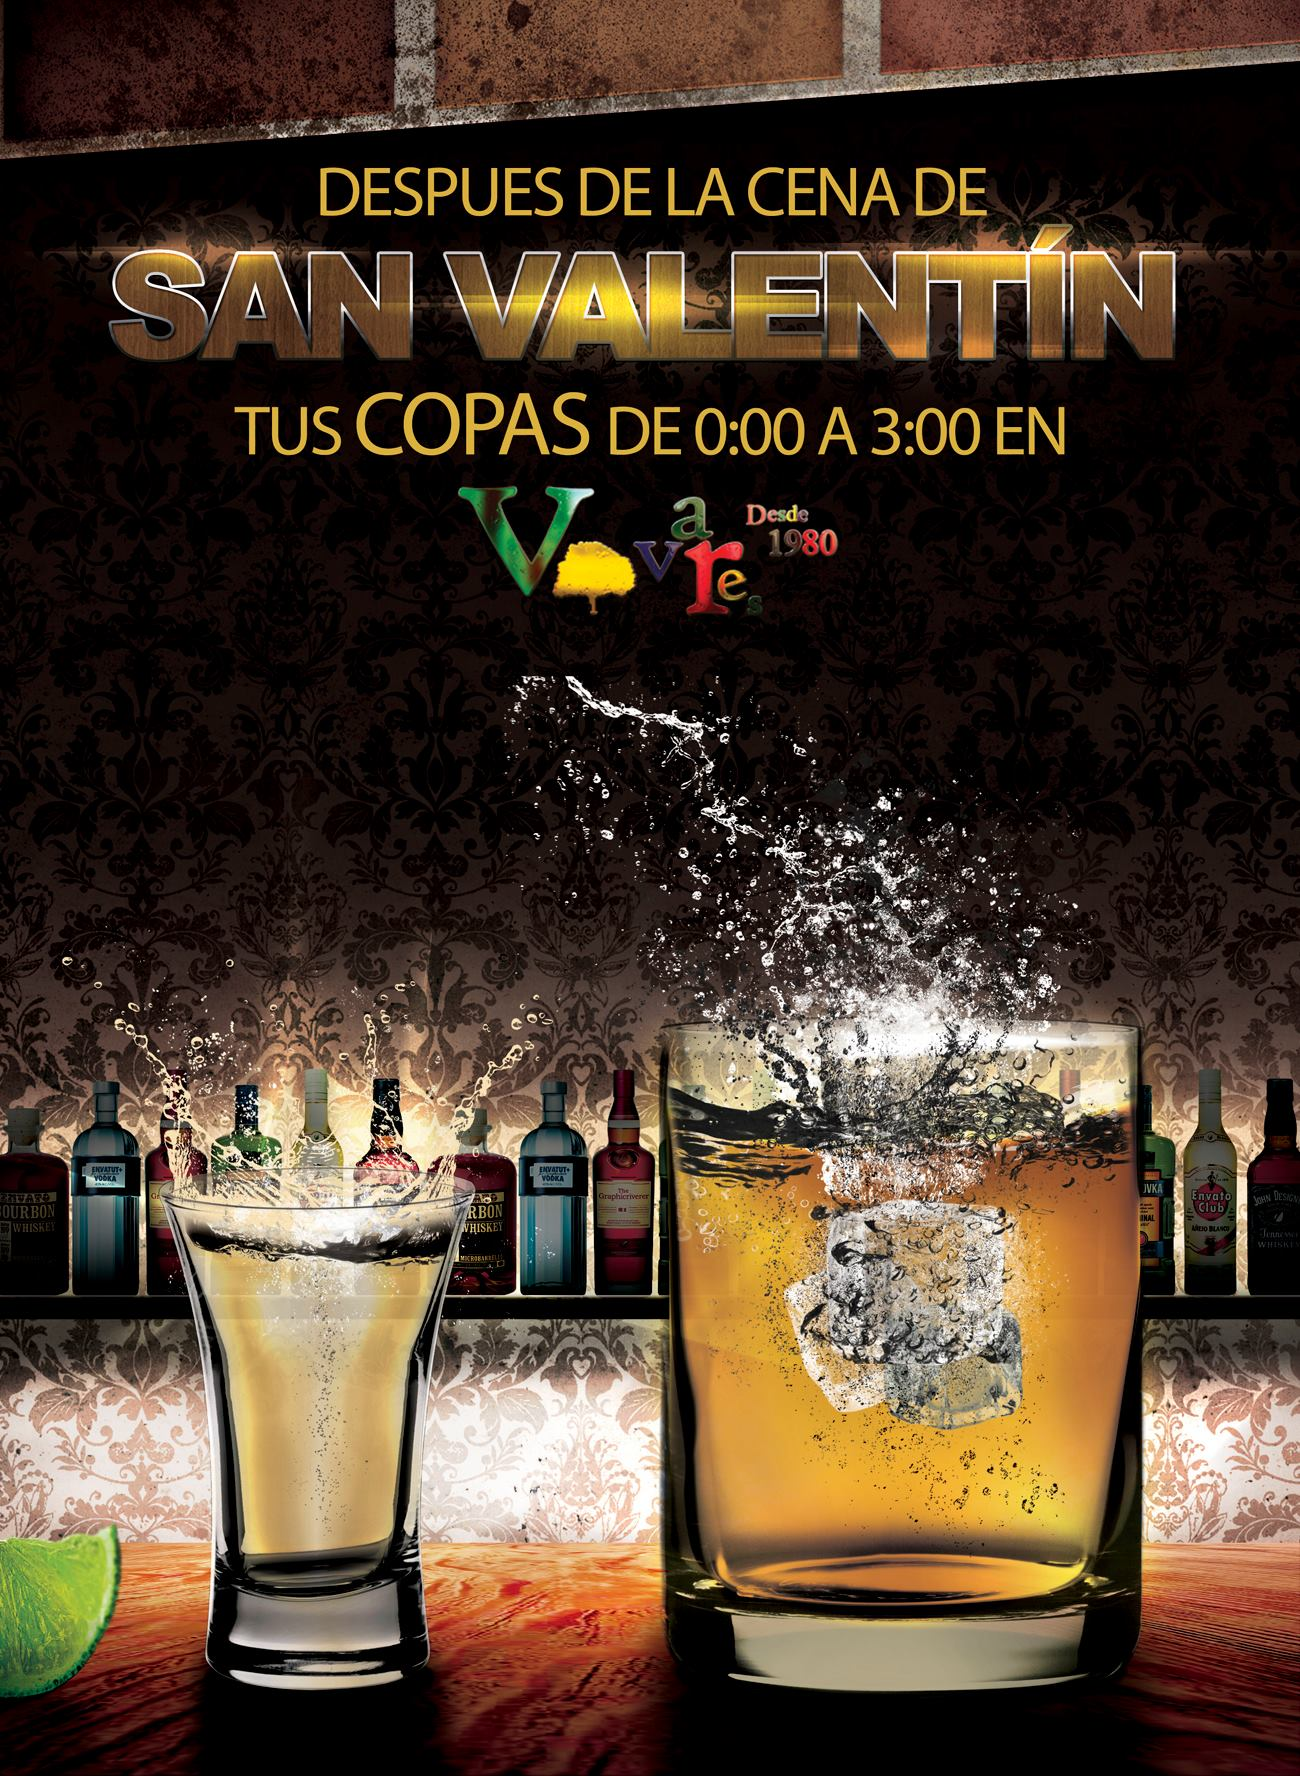 San Valentin en Vivares